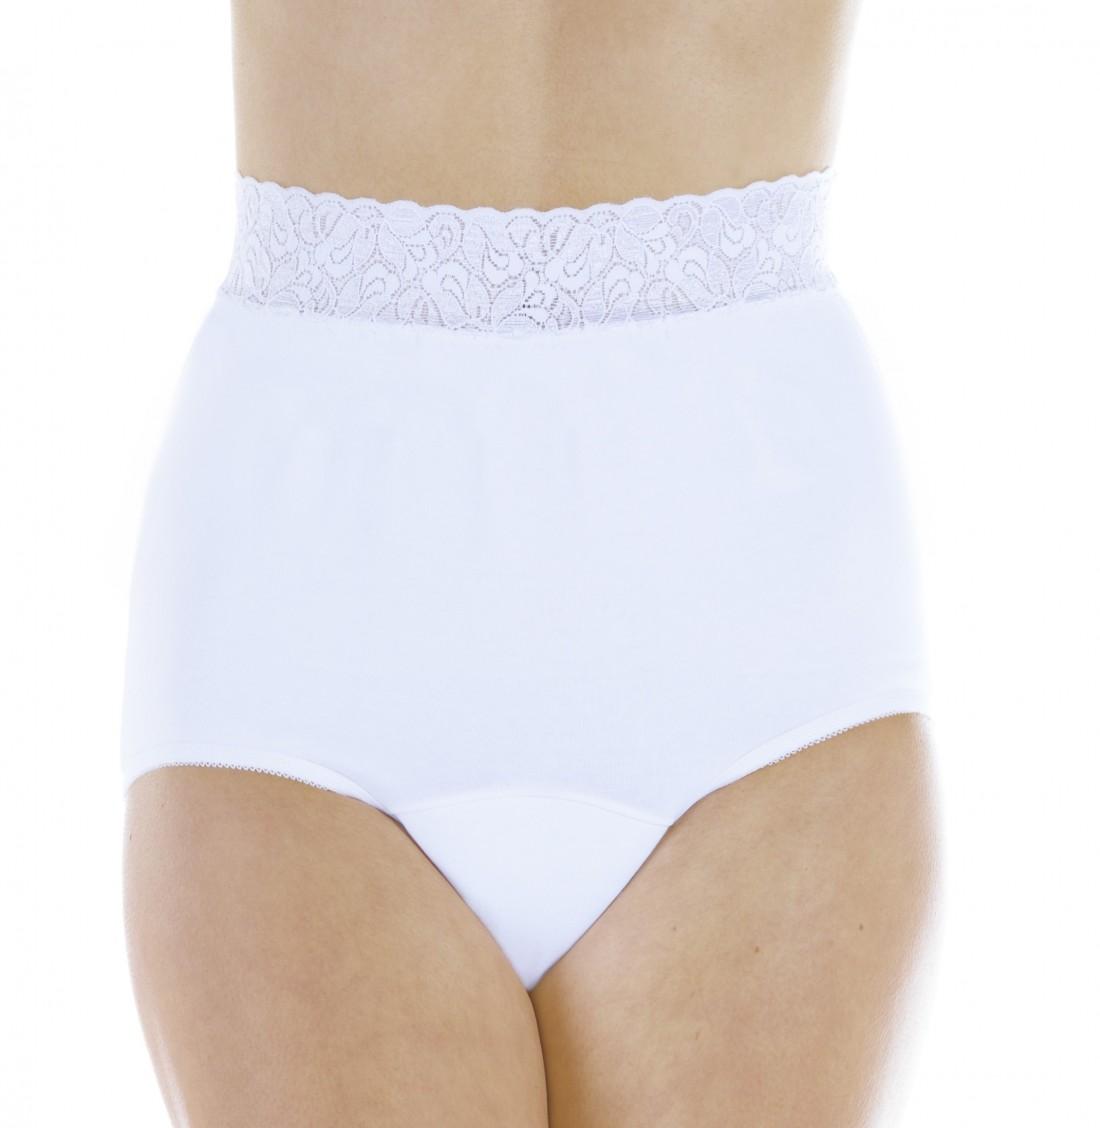 Lace Trim Panties - Wearever L10 - Regular Absorbency